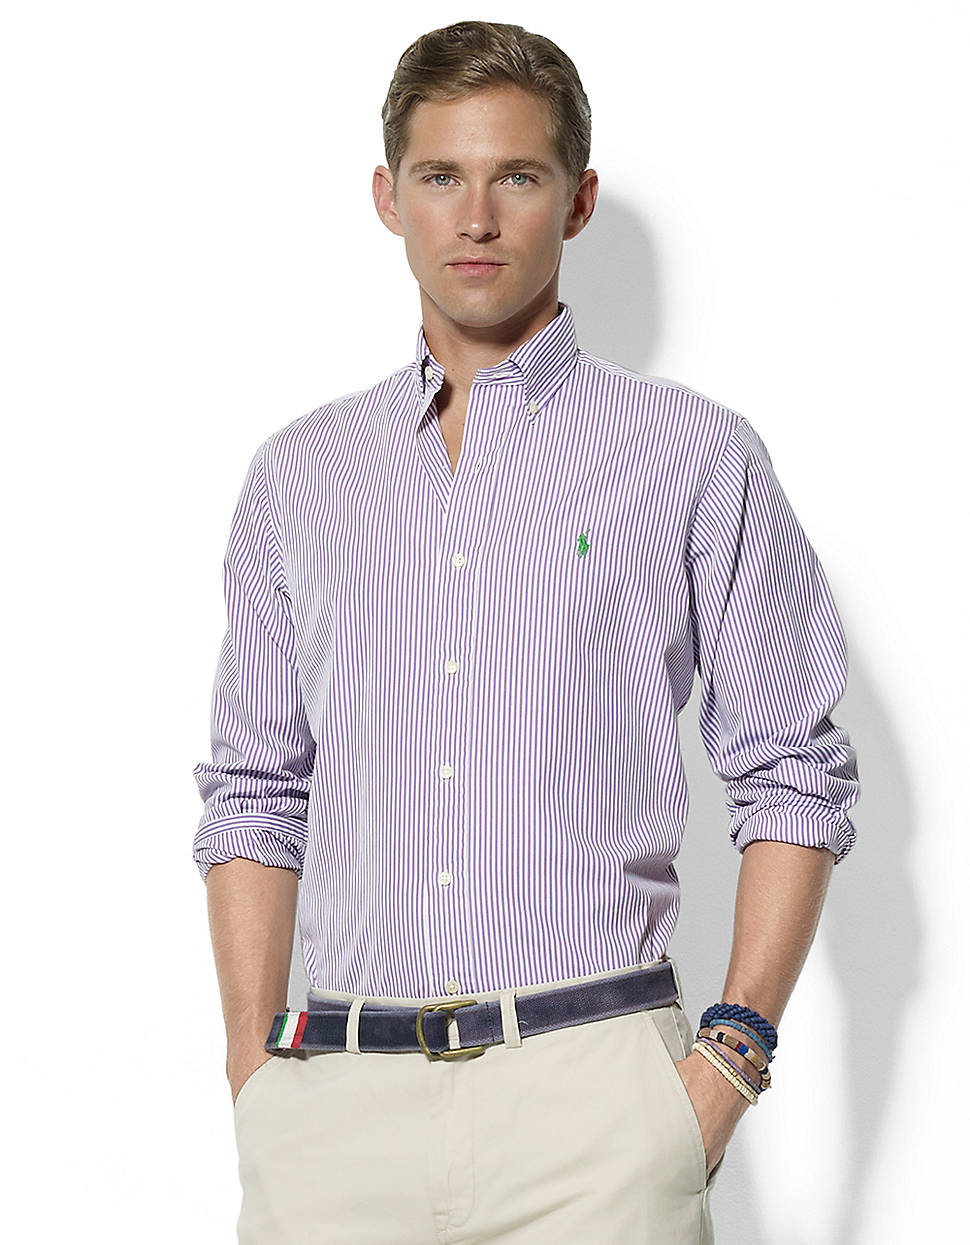 cb3da1ef75 Polo Ralph Lauren Custom Fit Striped Cotton Poplin Shirt in Purple ...